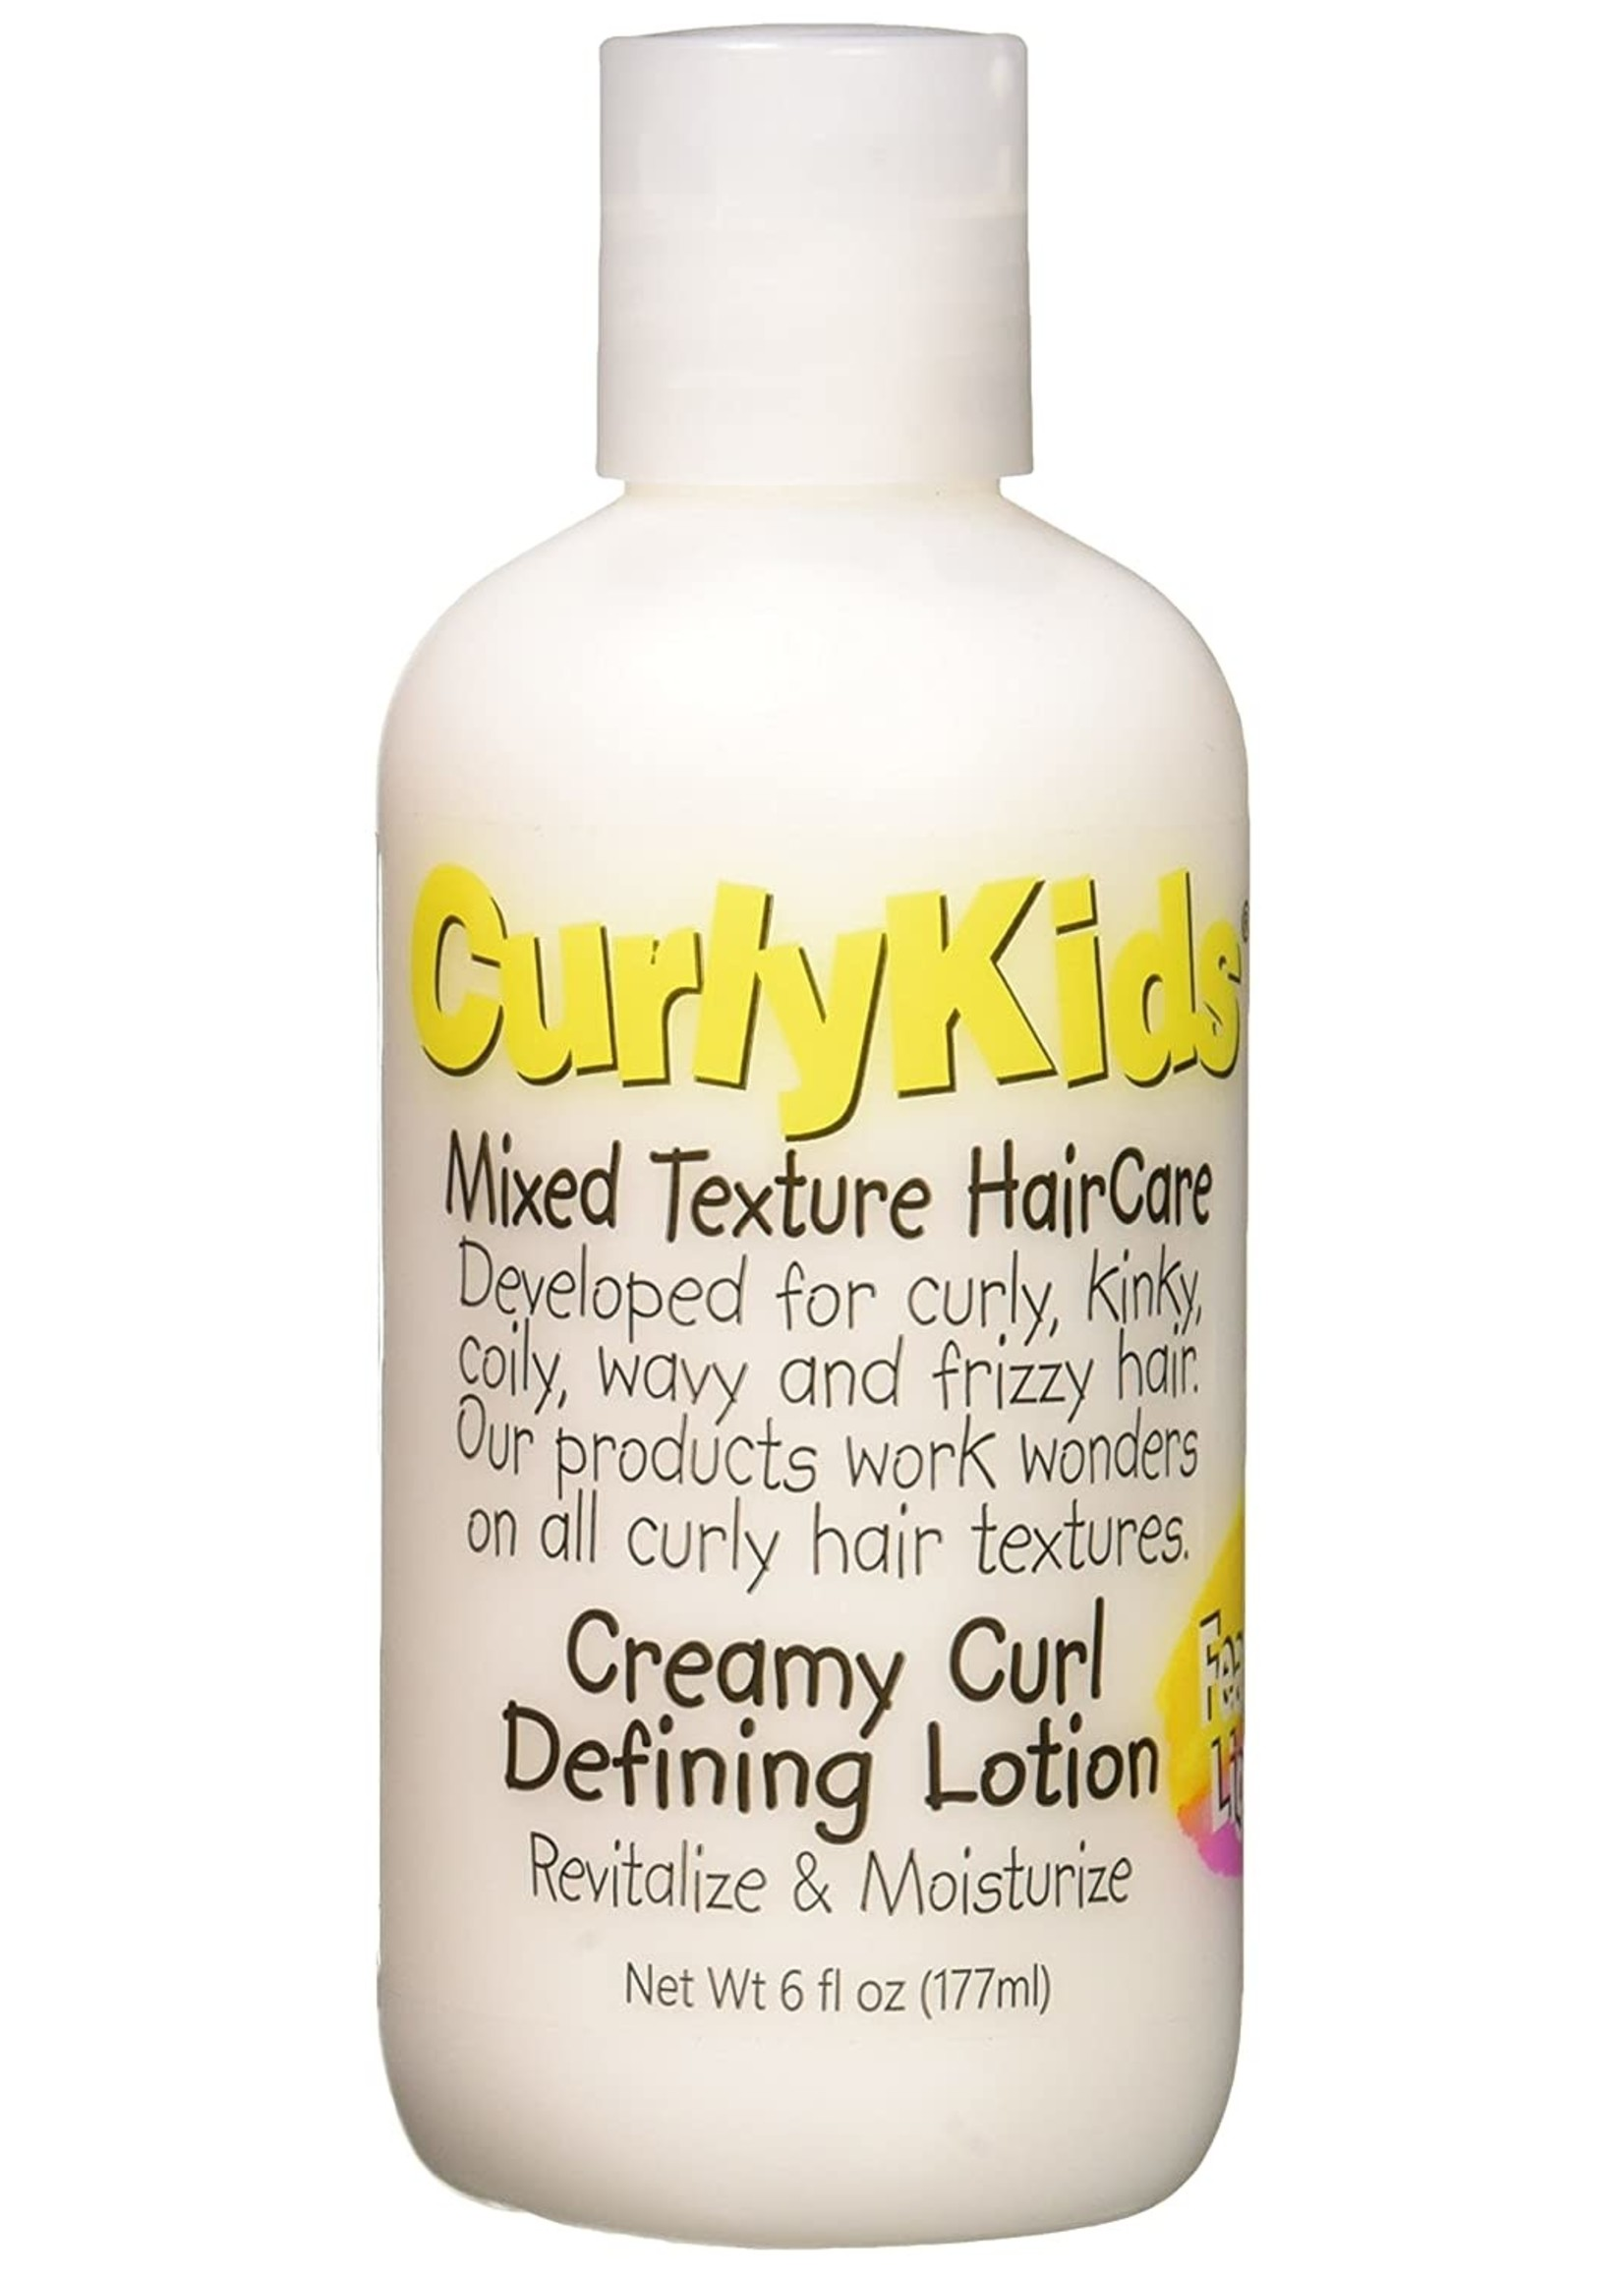 CurlyKids Creamy Curl Defining Lotion